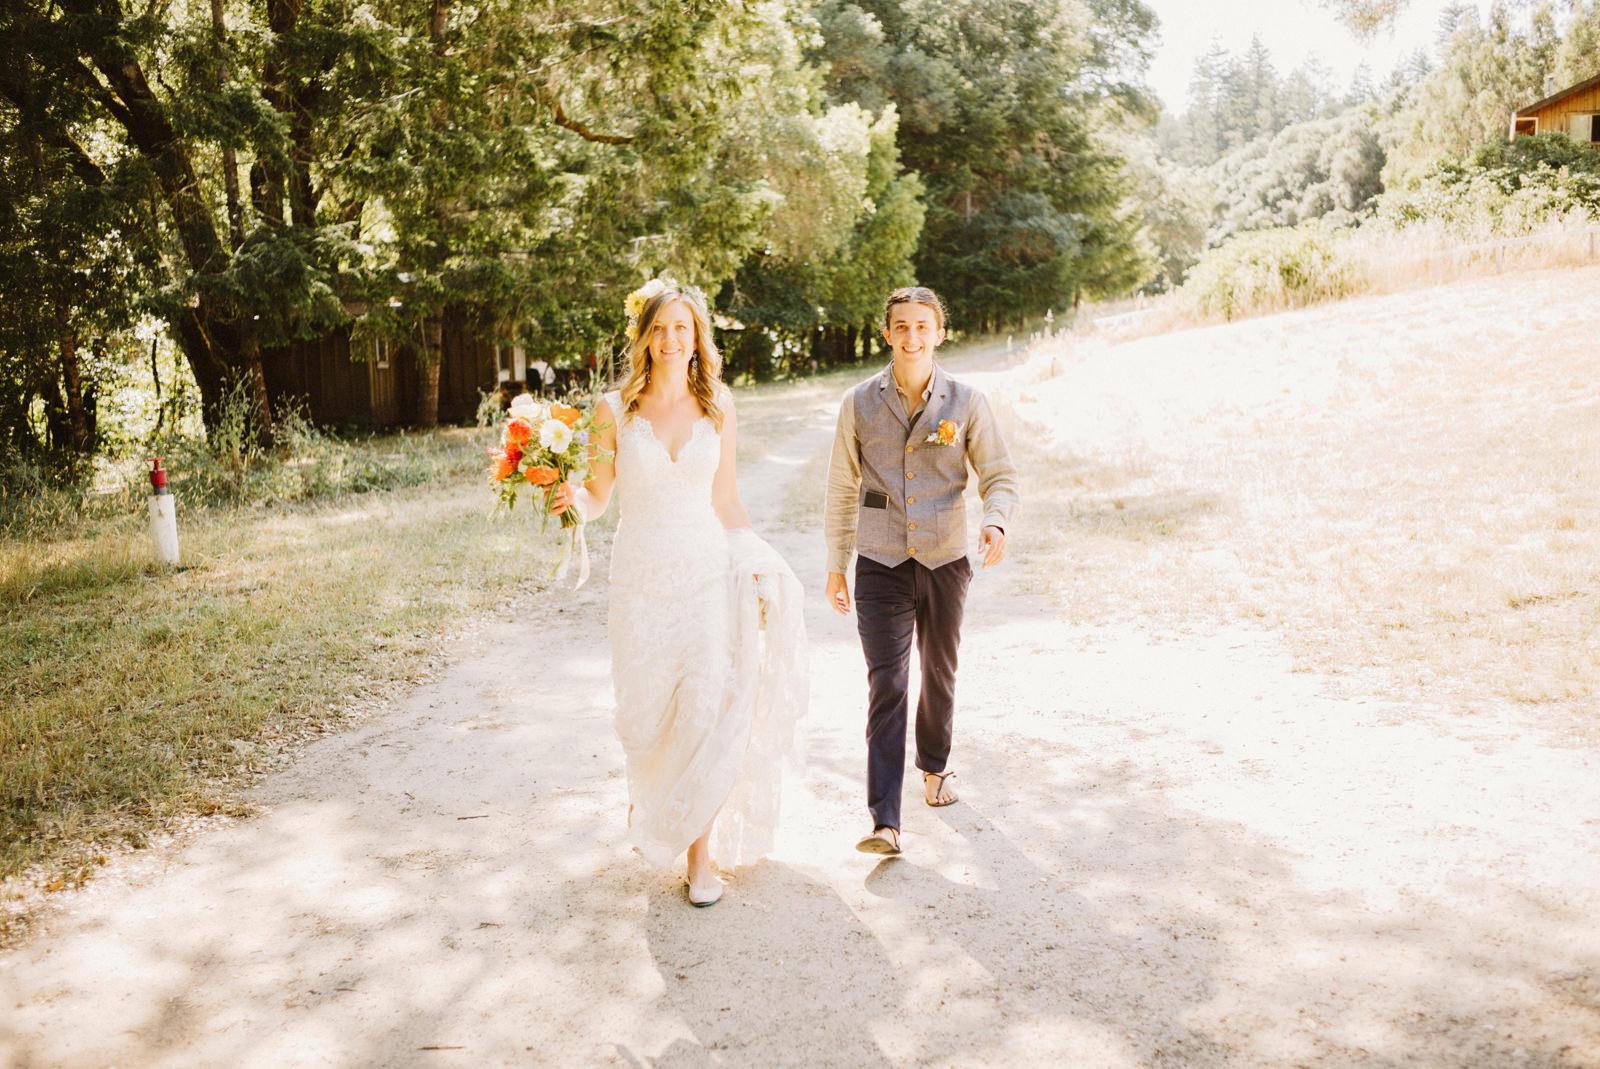 rivers-bend-retreat-wedding-048 RIVER'S BEND RETREAT WEDDING